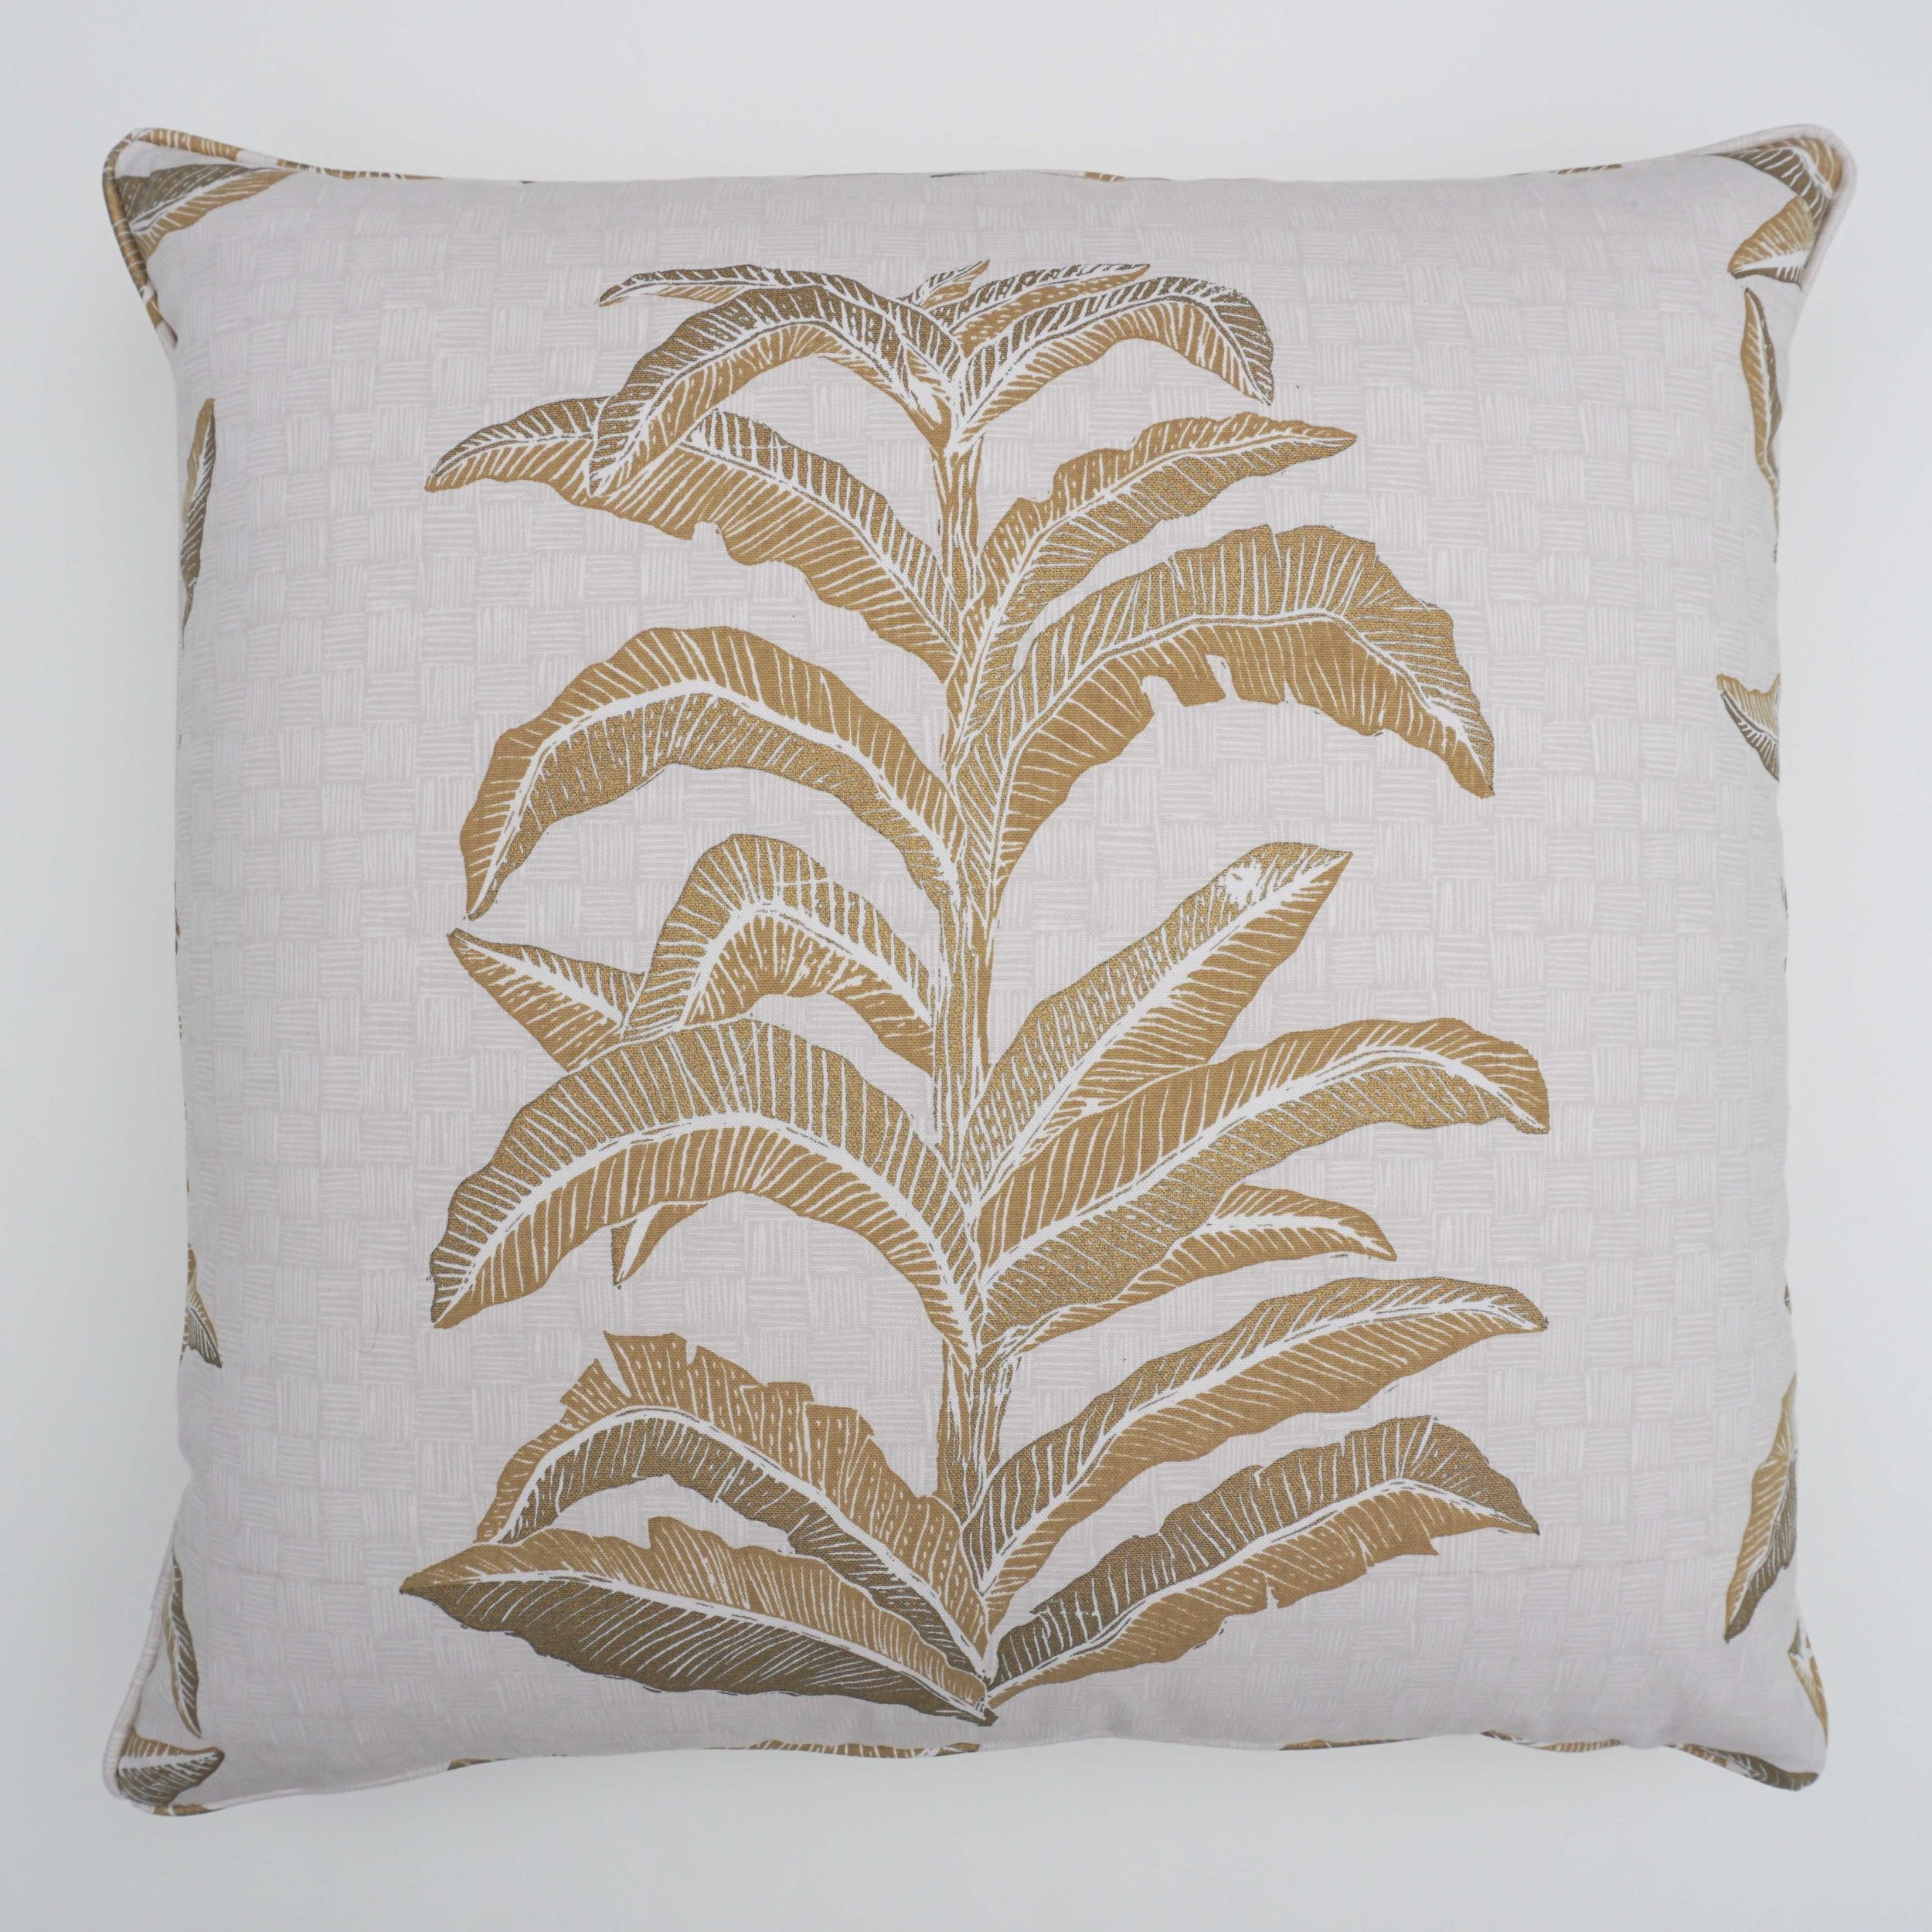 Banana Leaf in Gold, KF201-04P